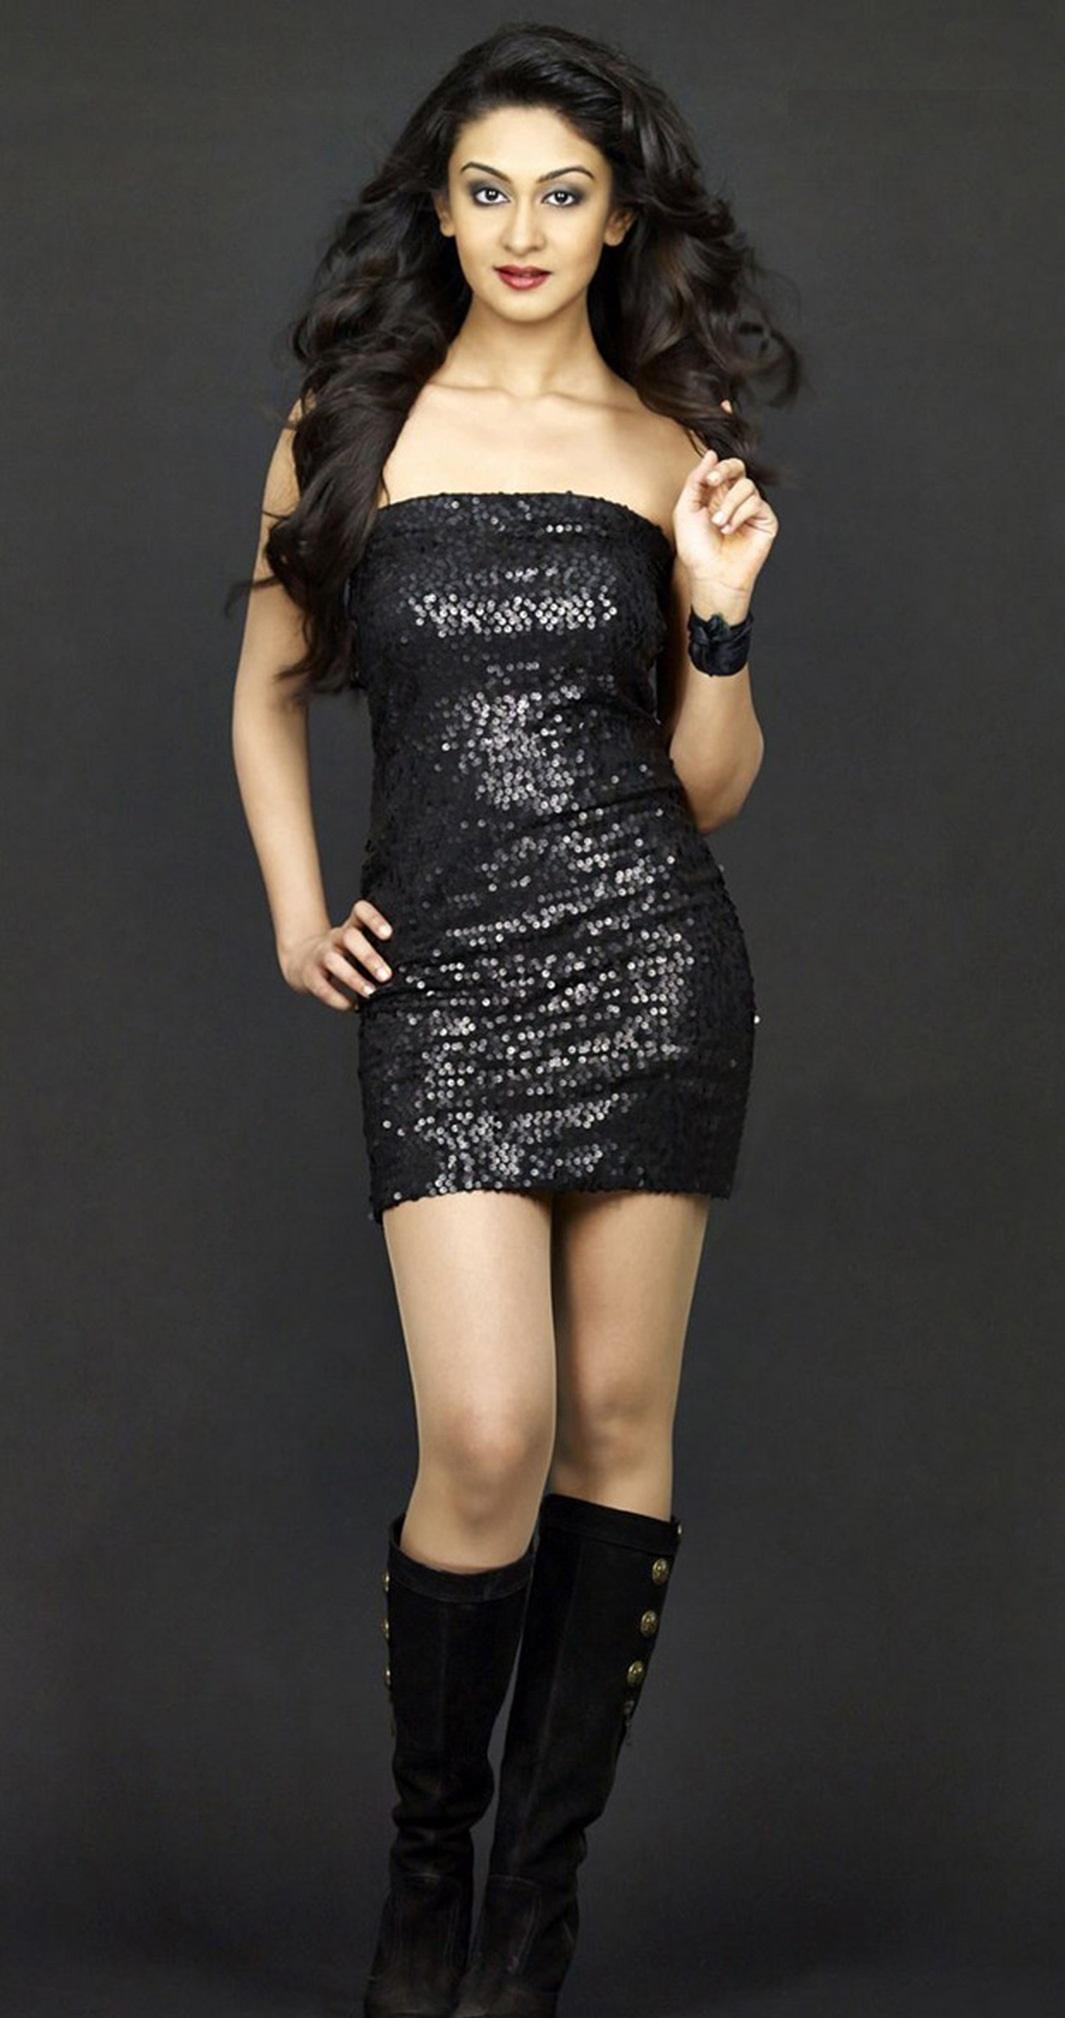 Aishwarya Arjun sexy images